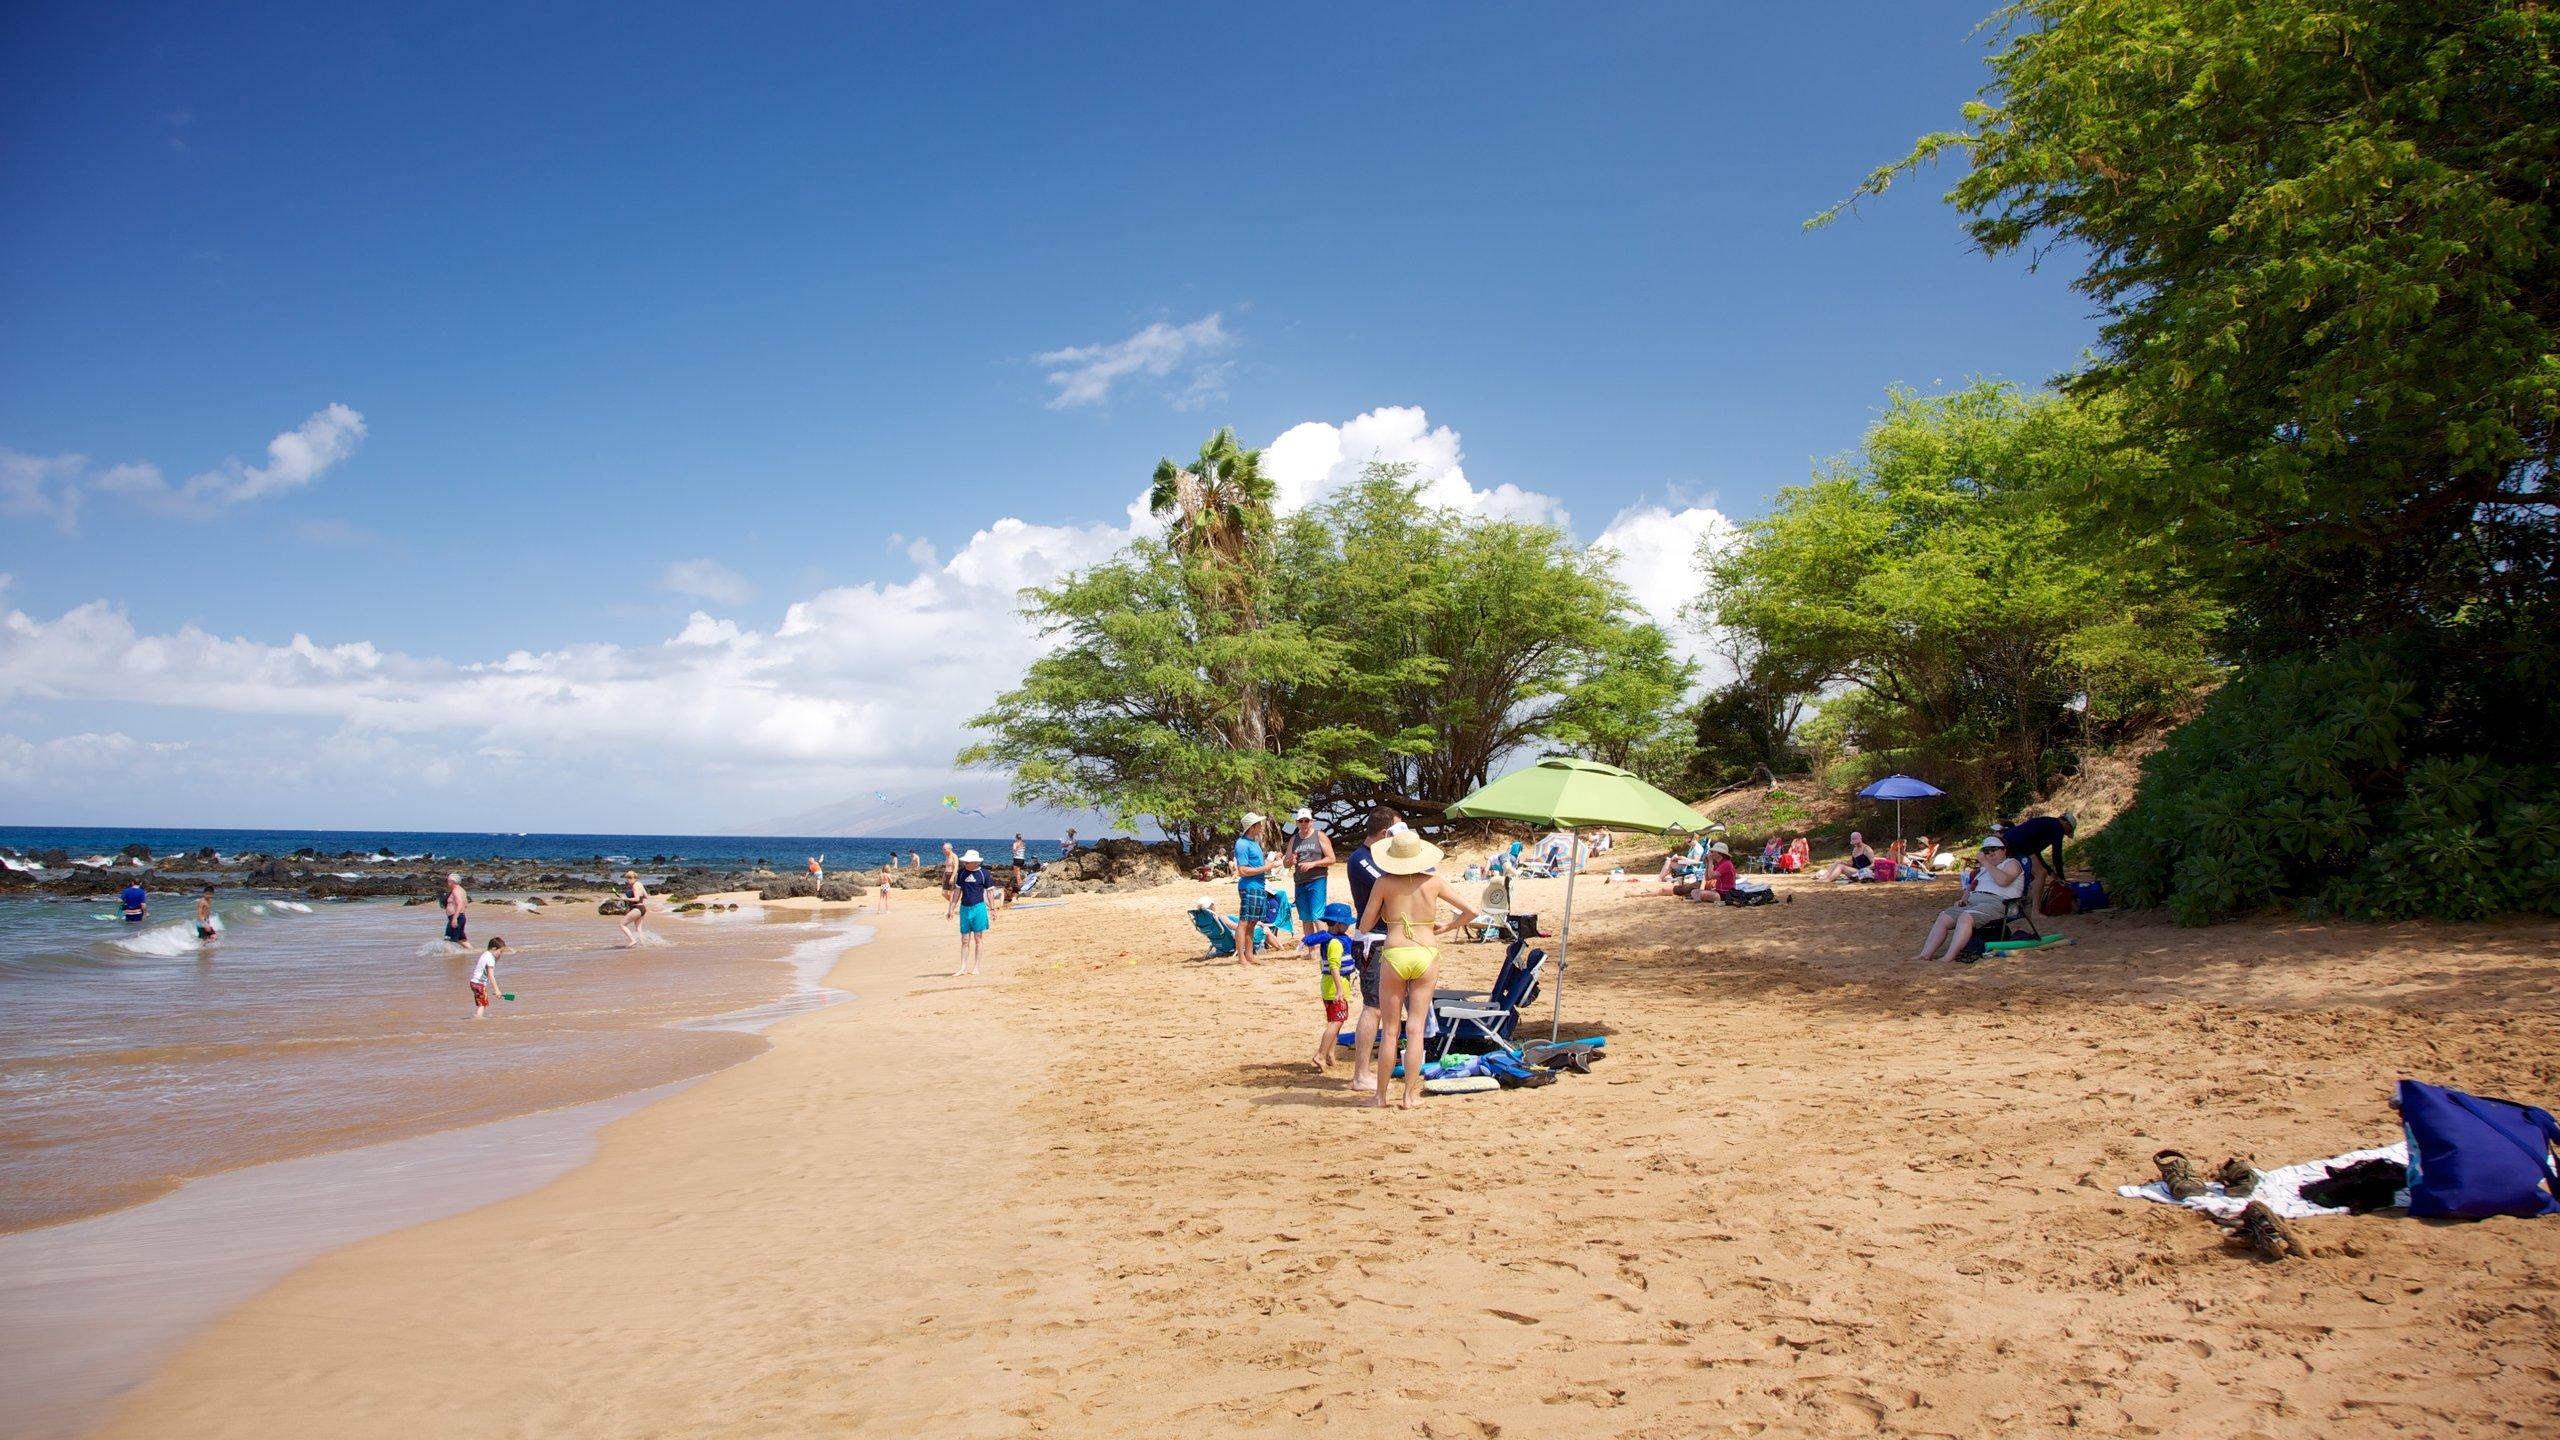 South Maui, Hawaii, United States of America